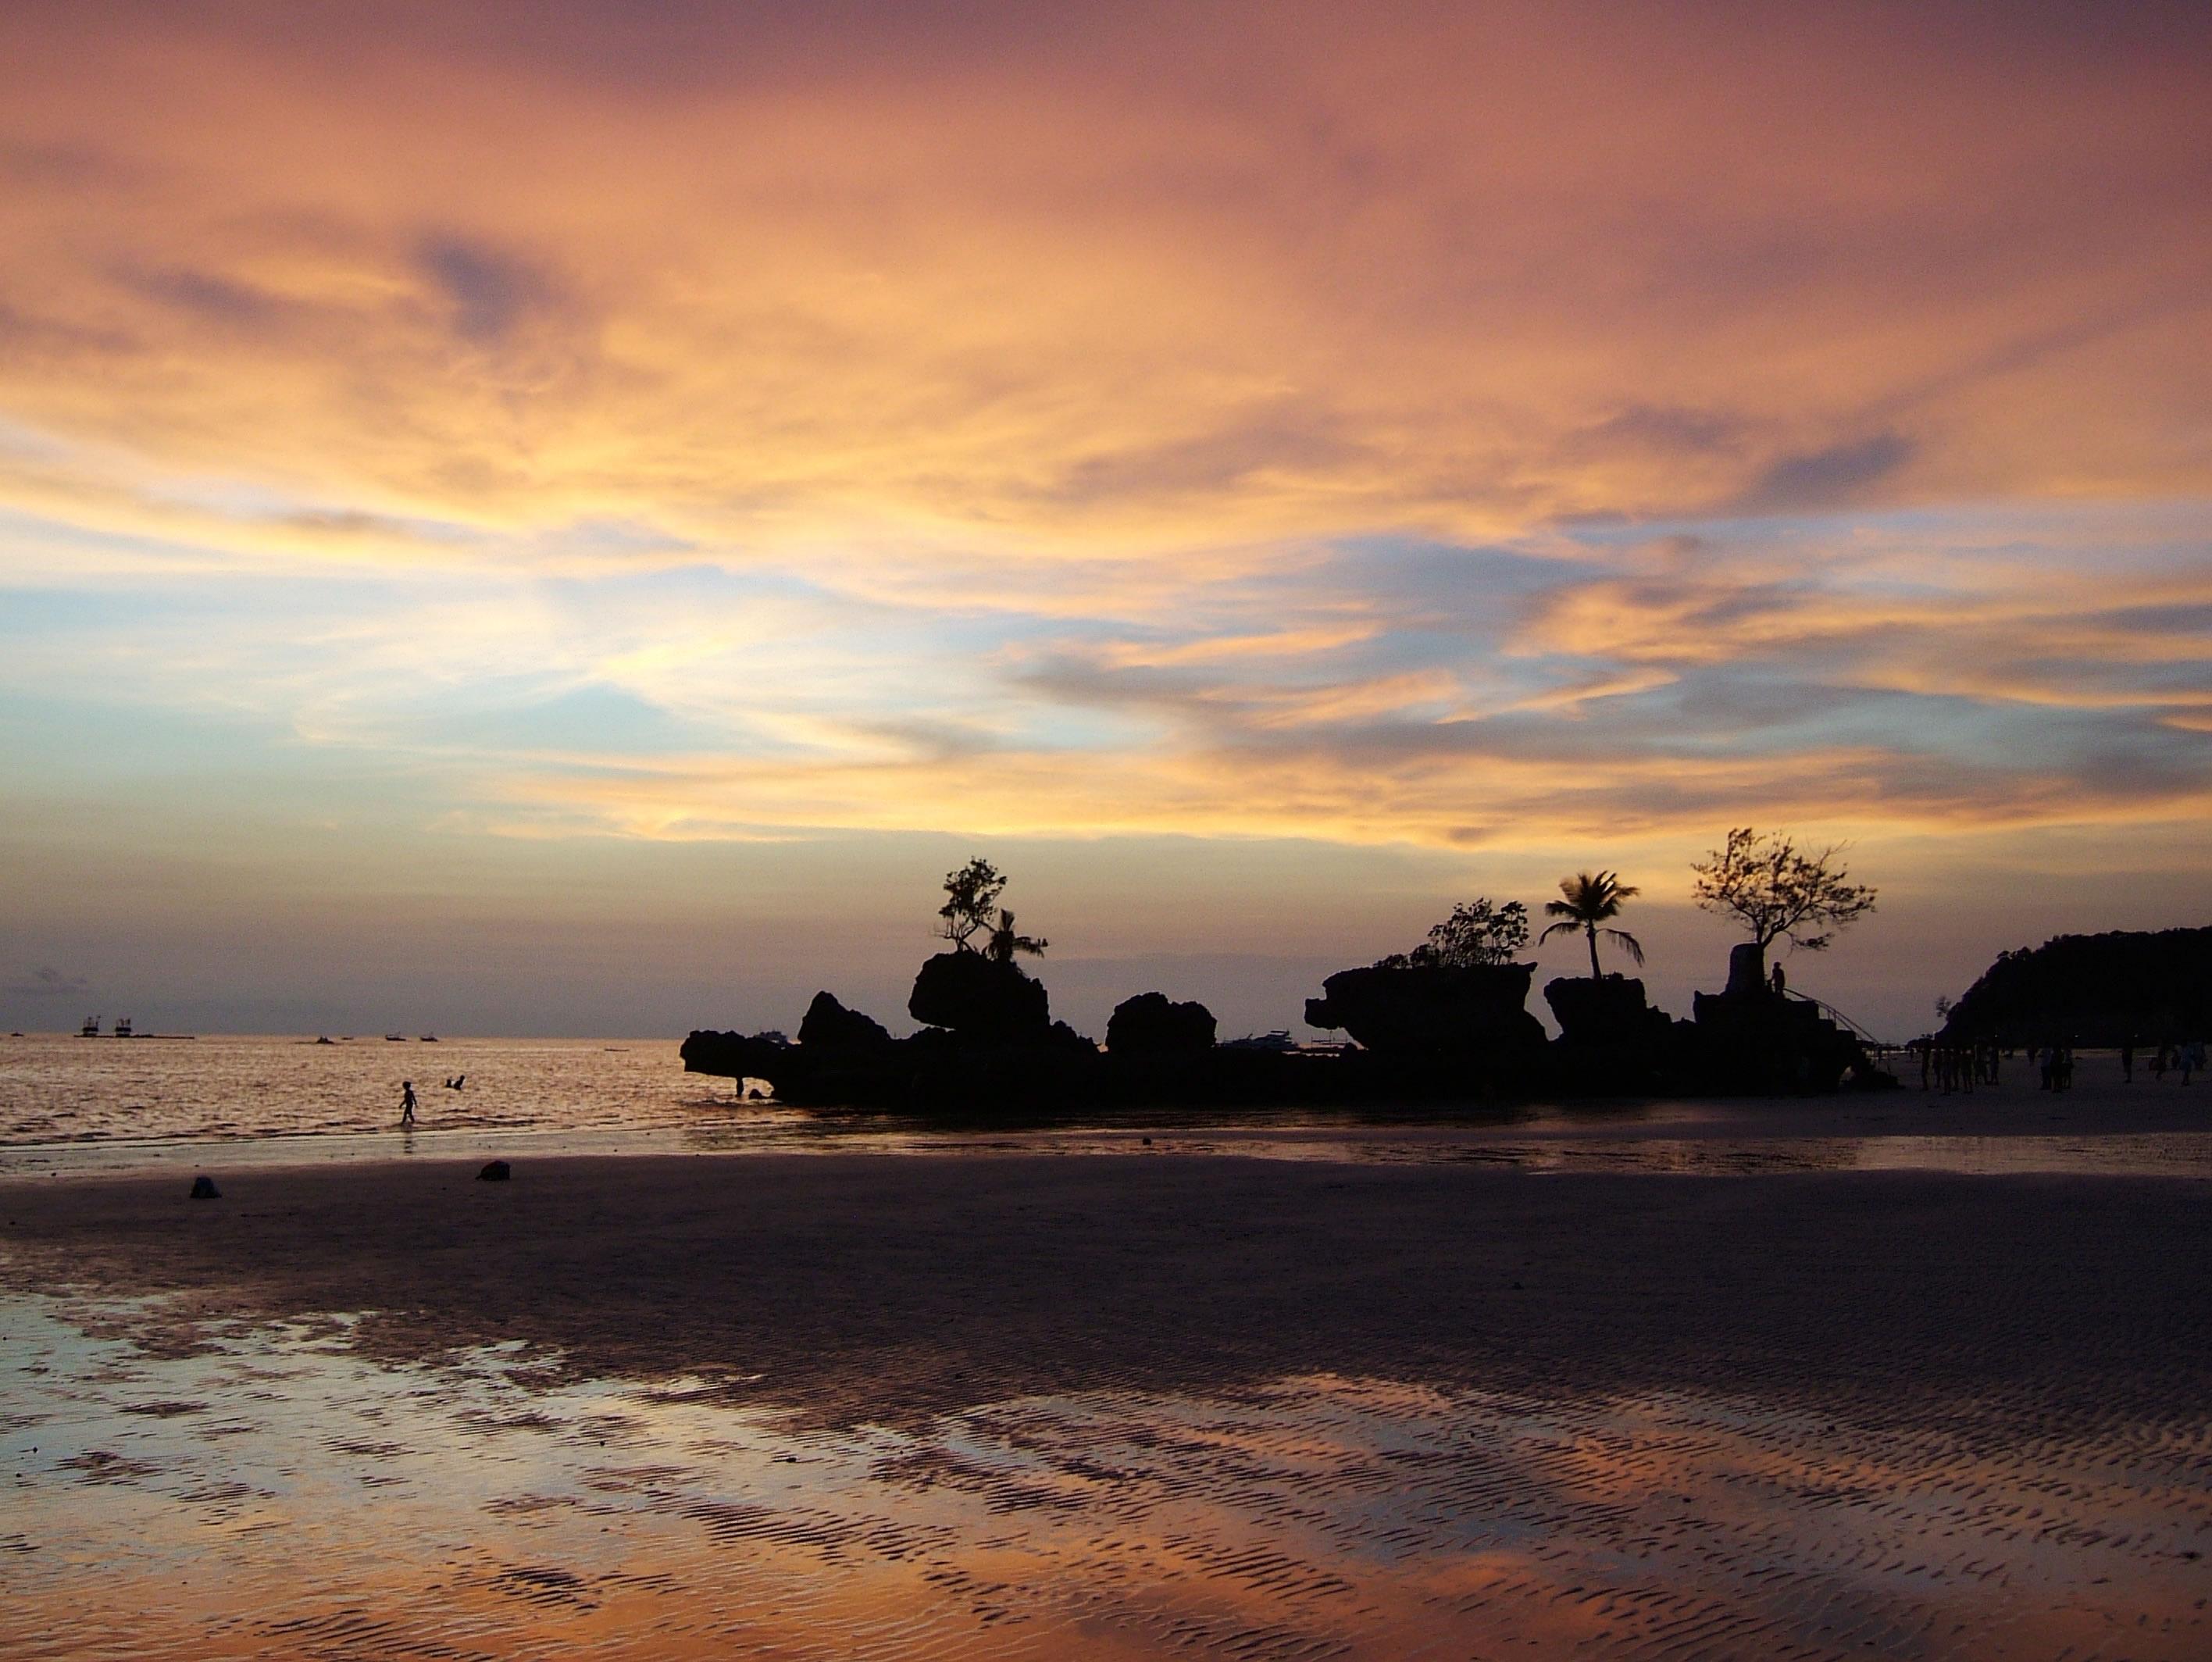 Philippines Sugar Islands Caticlan Boracay White Beach Sunset 2007 50